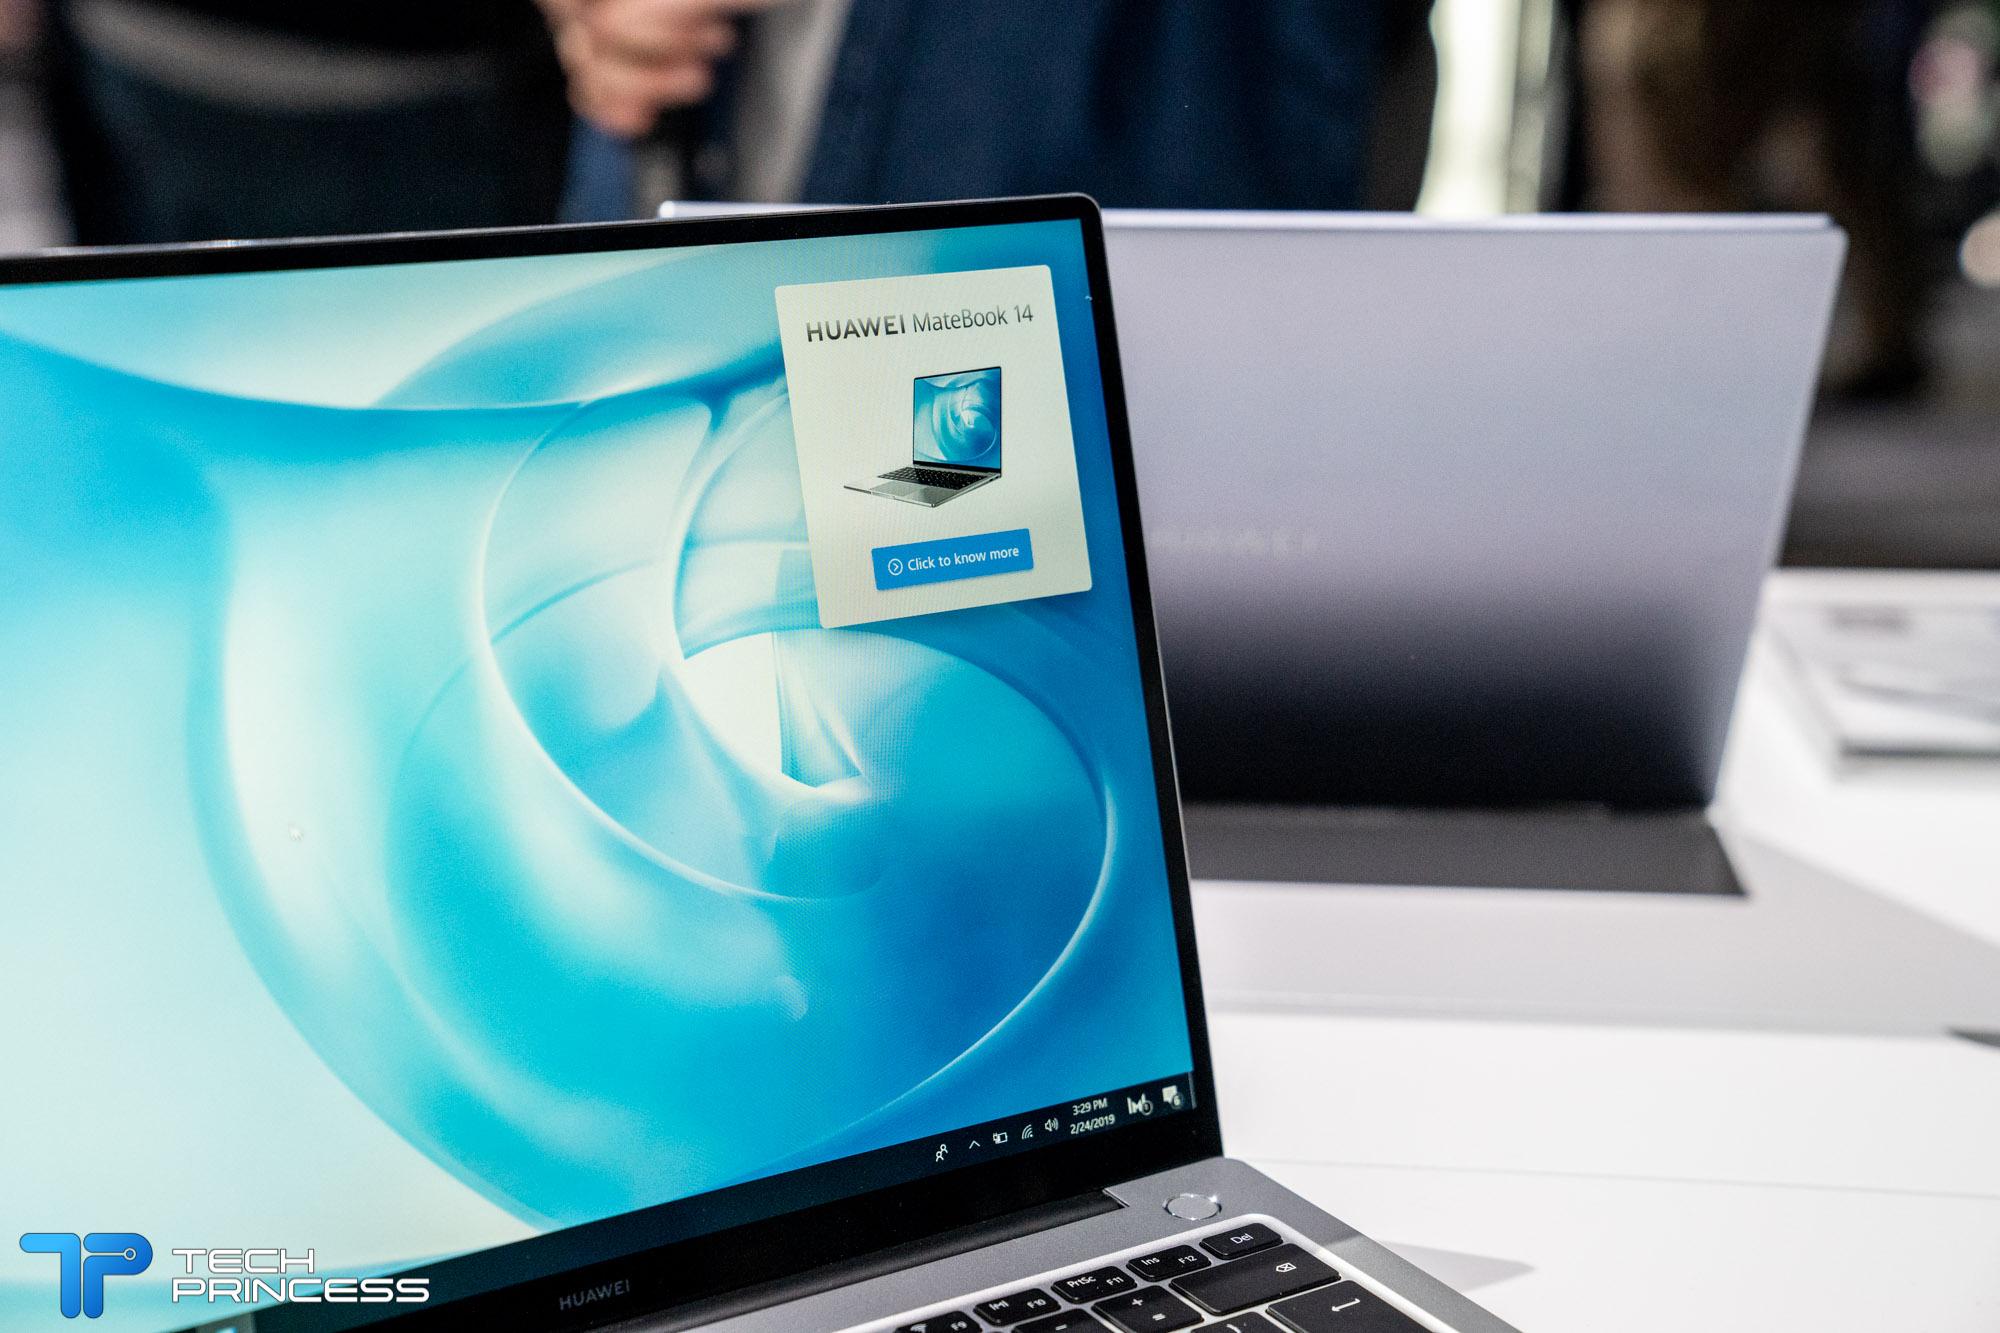 Huawei MateBook 14 è ufficiale: tutte le novità del nuovo notebook cinese thumbnail